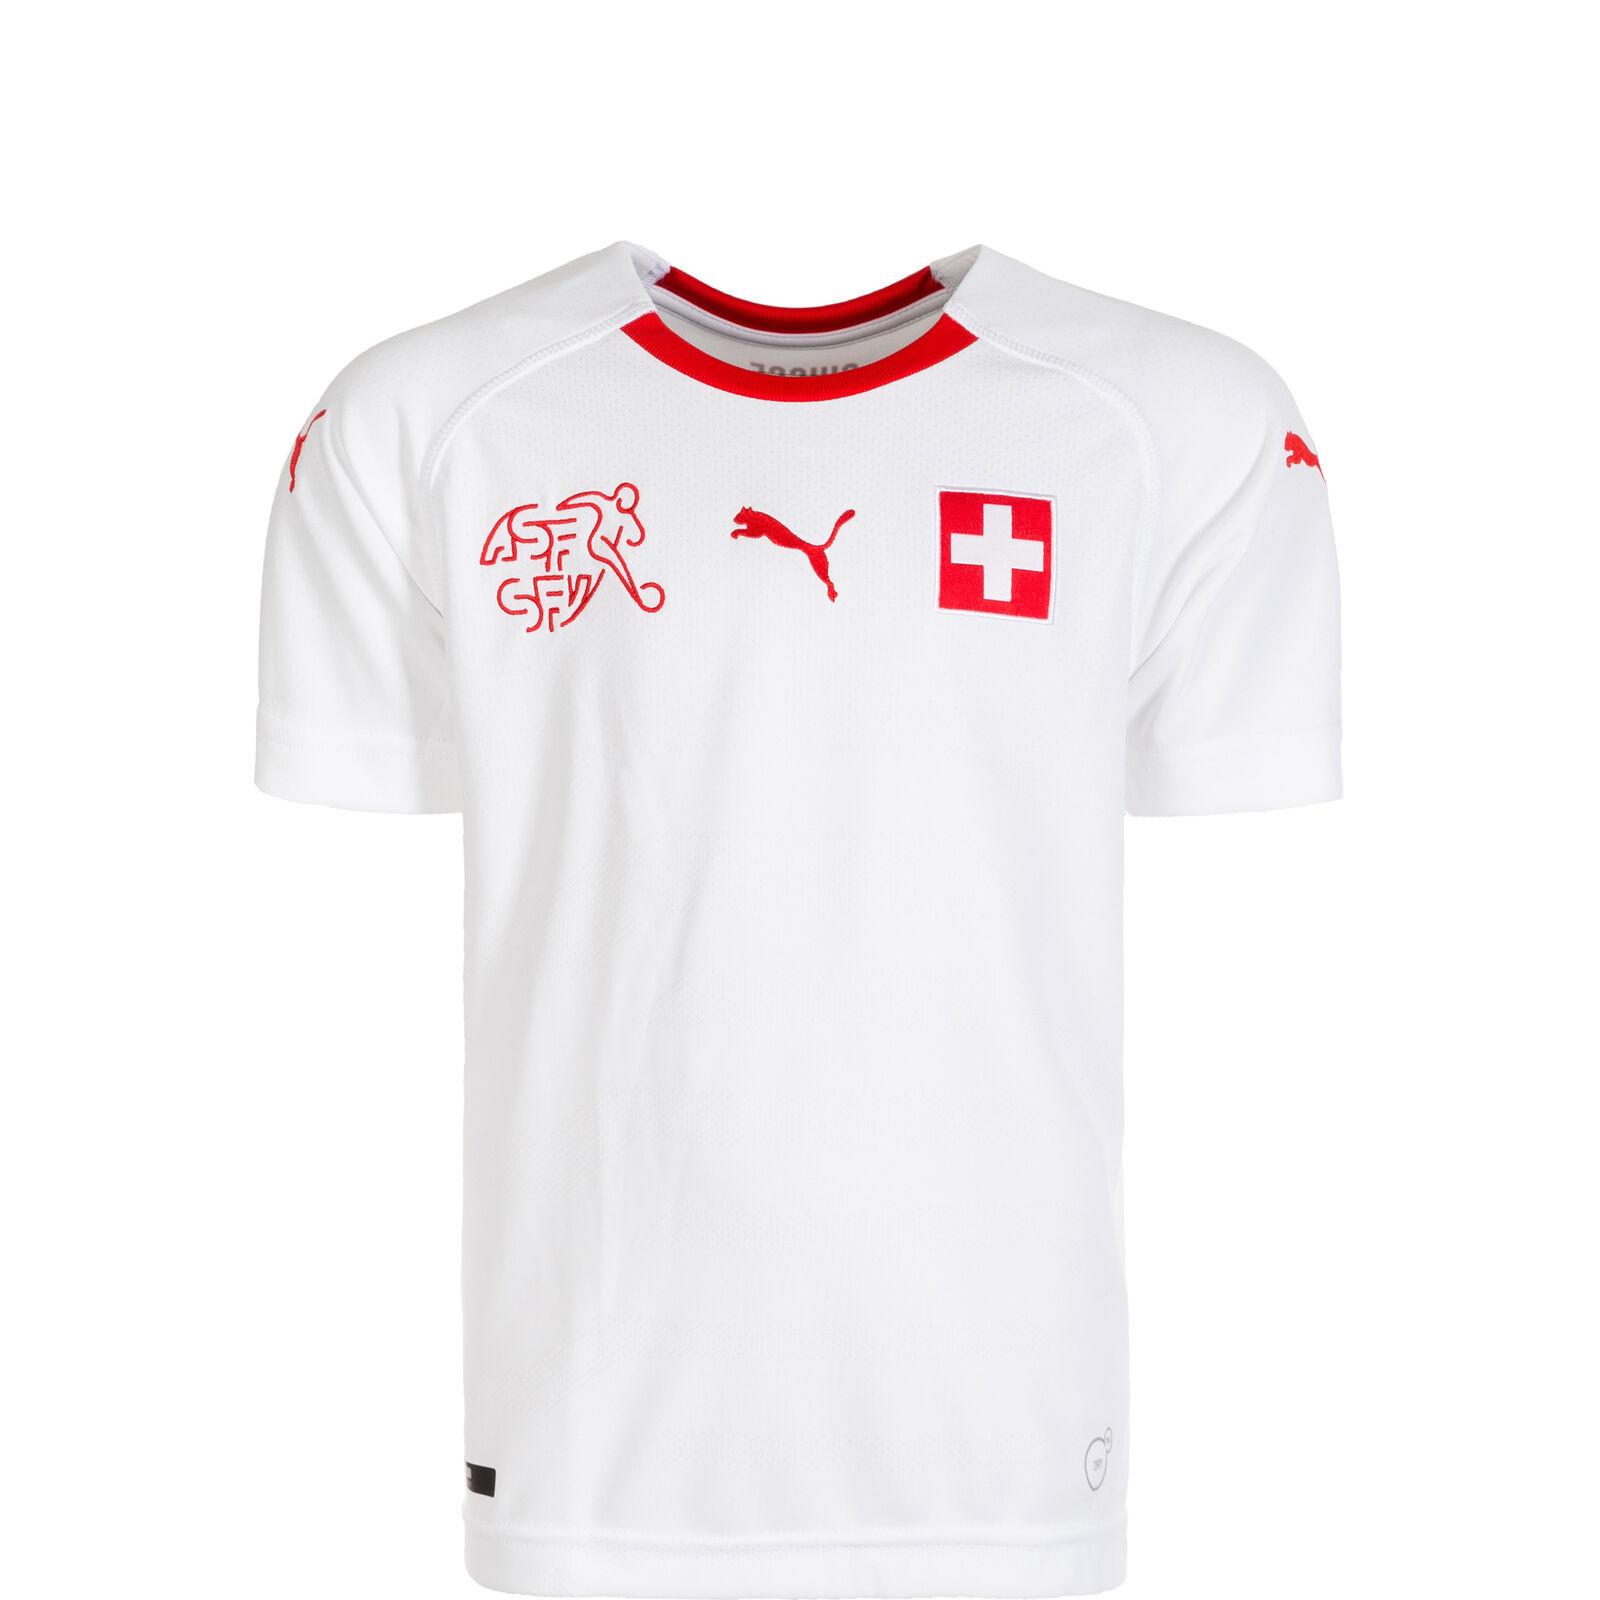 Puma Schweiz Trikot Away WM 2018 Kinder weiß / rot NEU